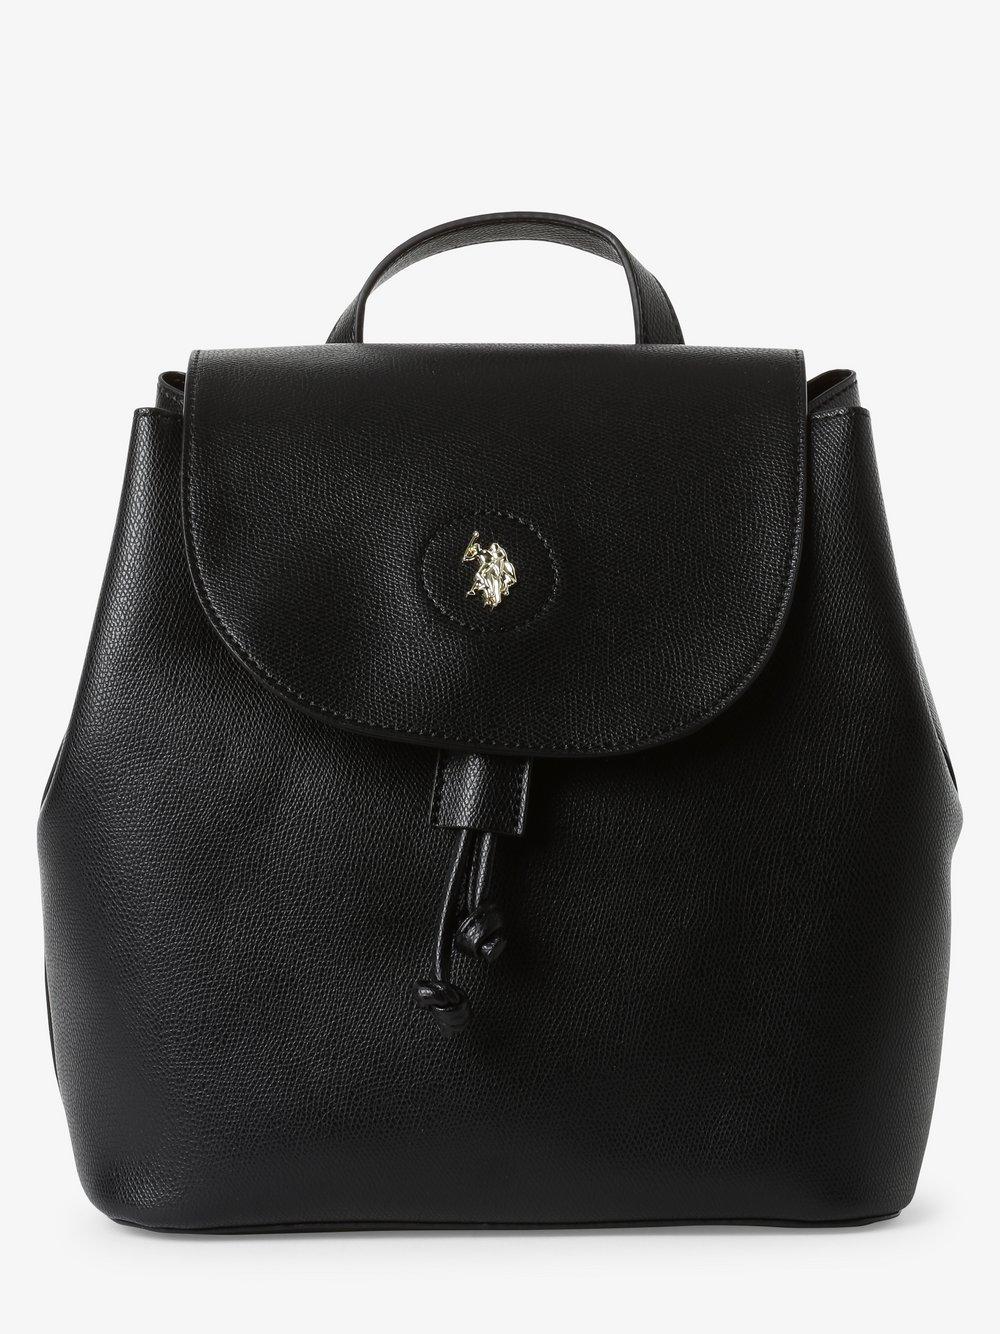 U.S. Polo Assn. – Plecak damski, czarny Van Graaf 466423-0001